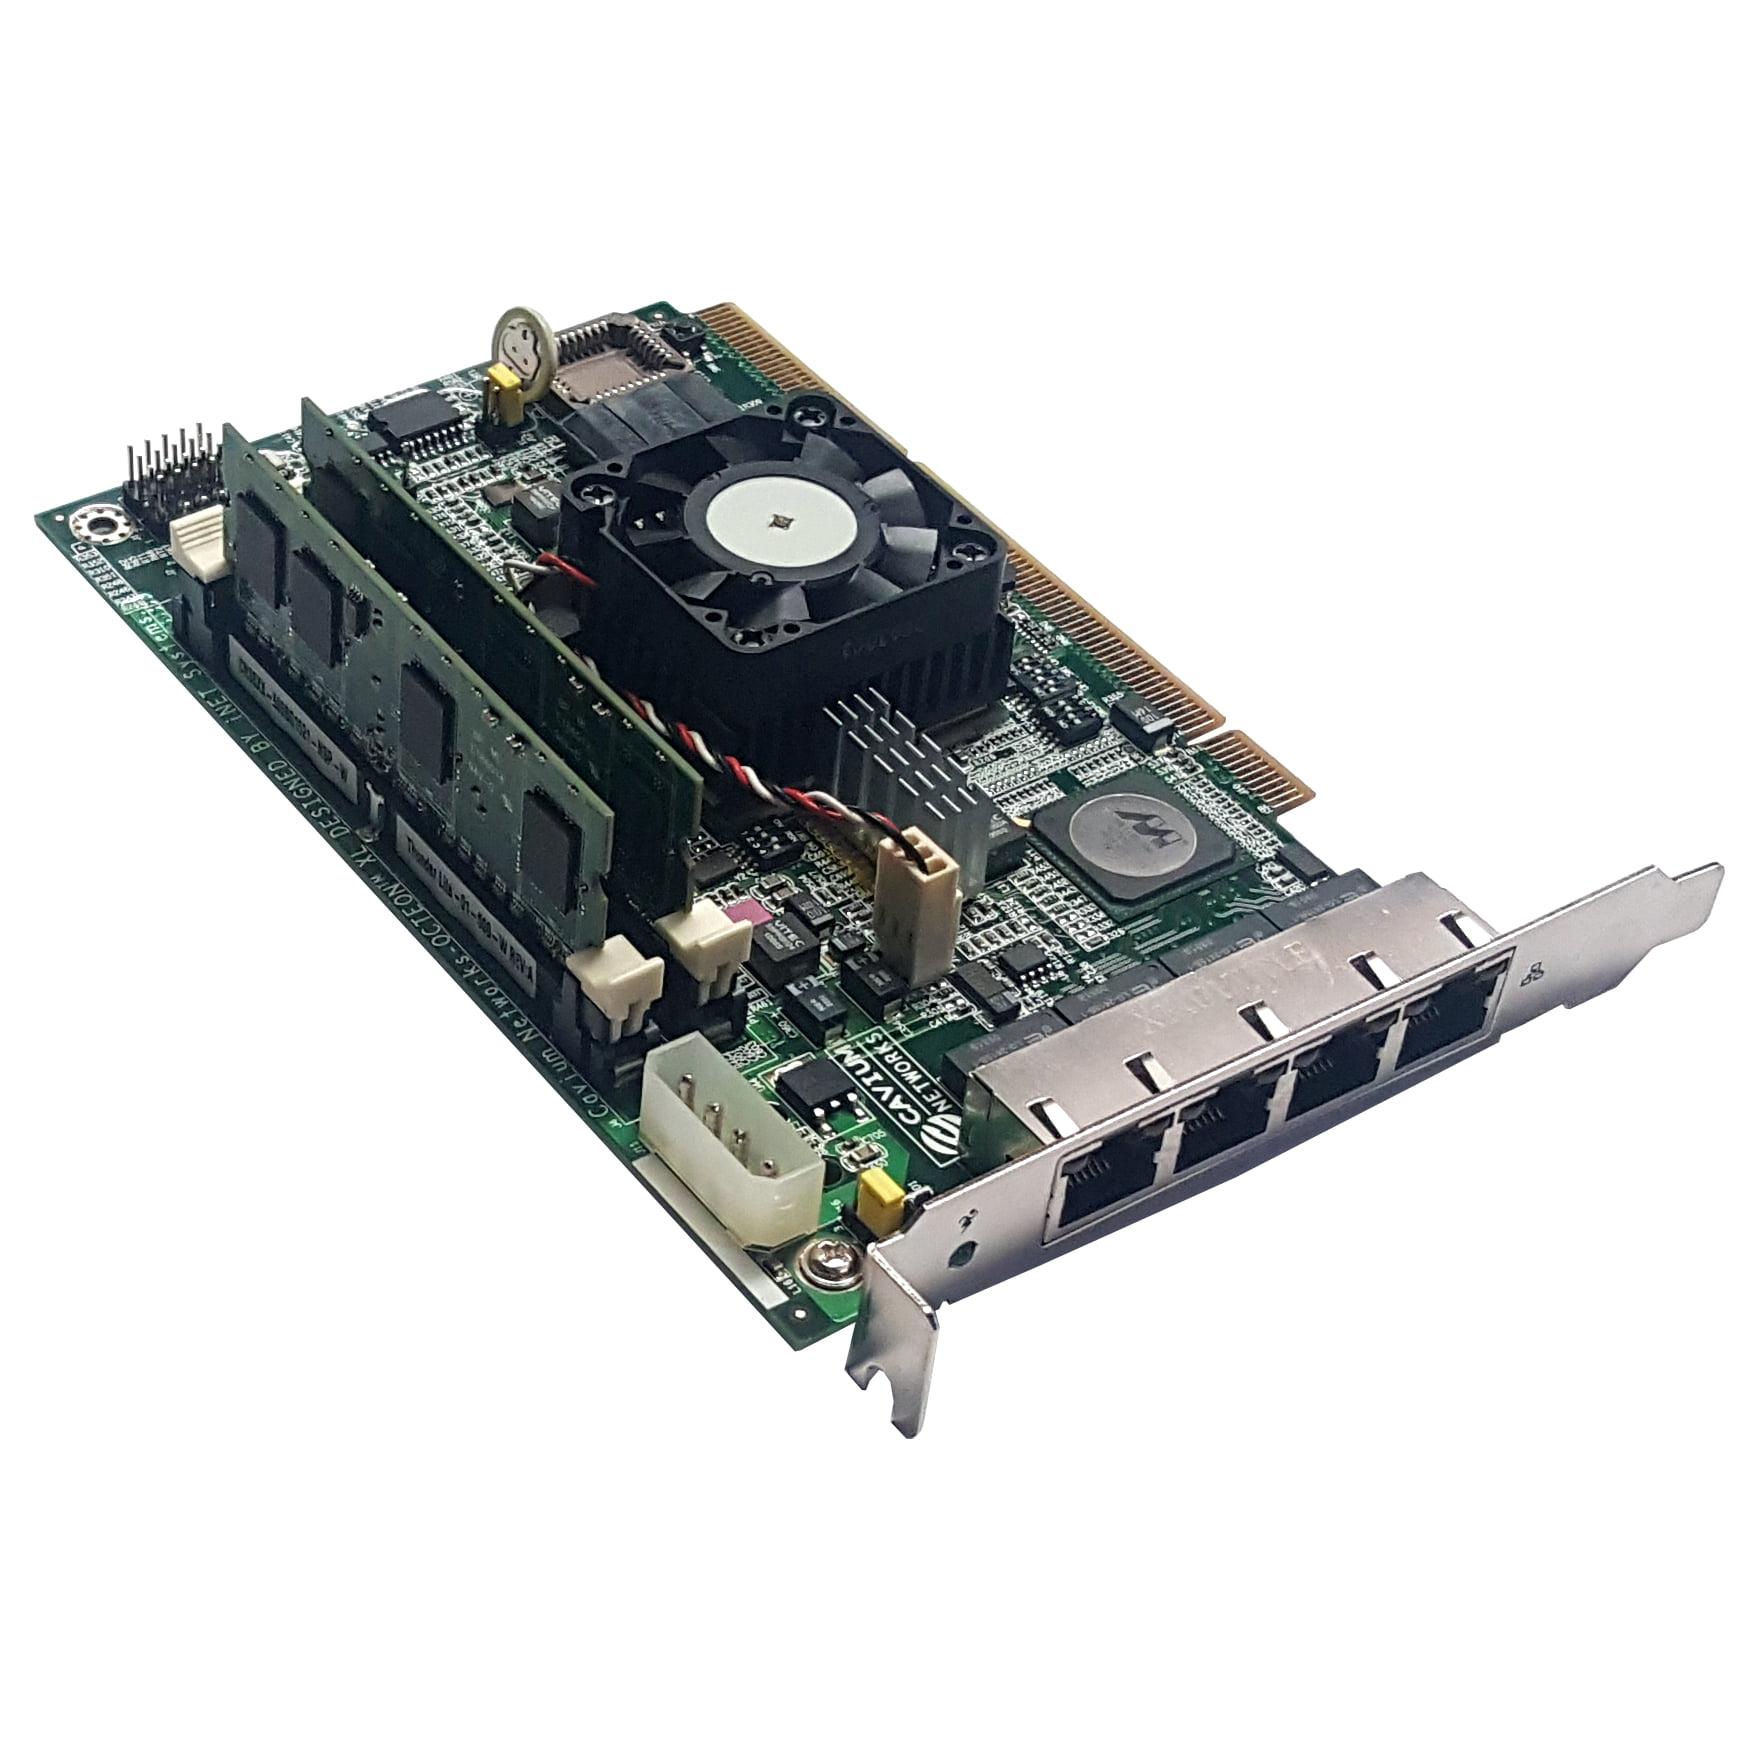 Cavium Networks CN3860-500-NSP-NIC4-W-M2-G 2GB OcteonXL NICPro Accelerator Card Refurbished